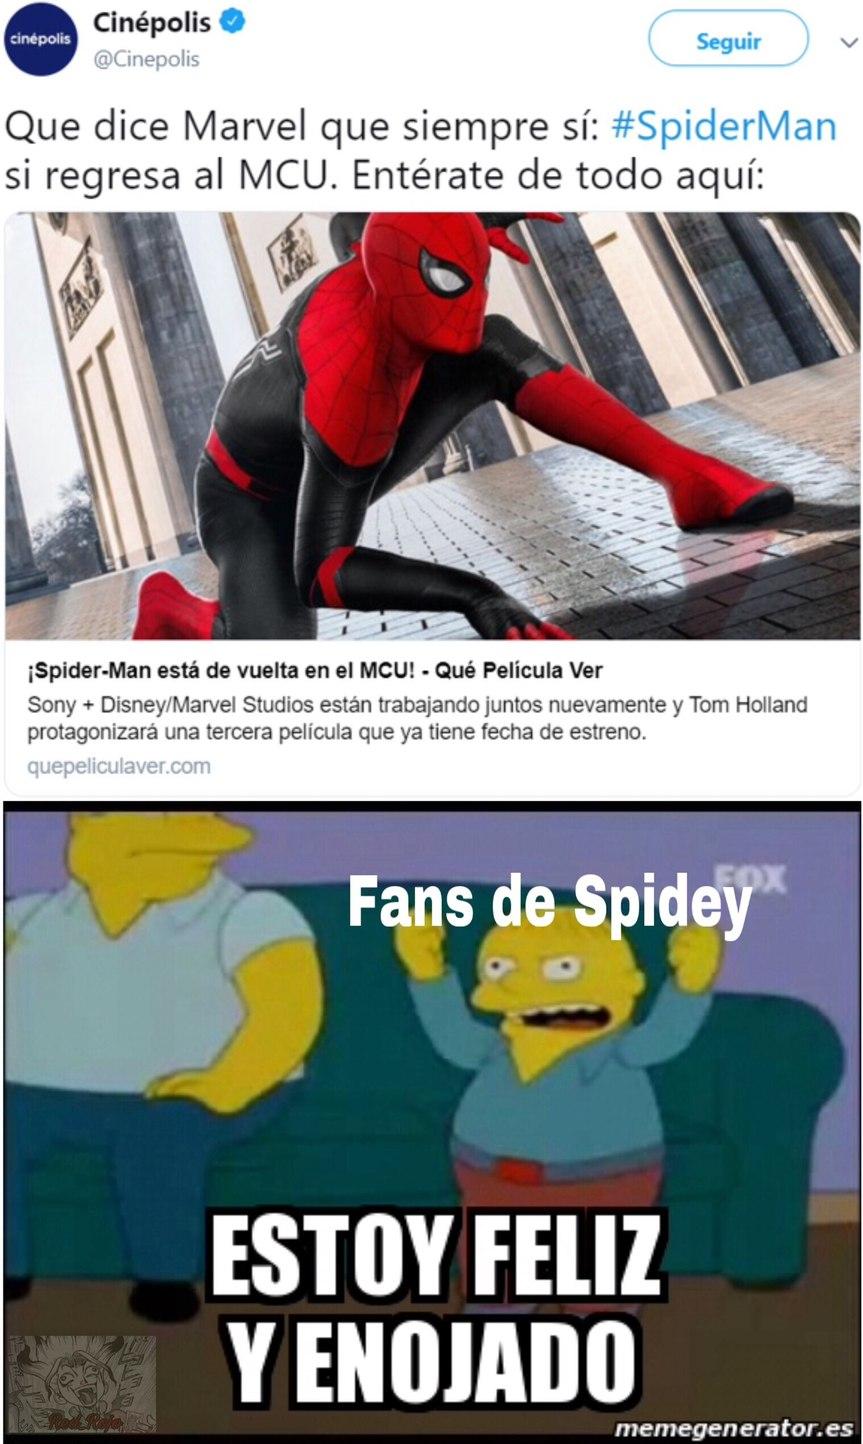 Sony y Disney: Uy mucho dinero . - meme